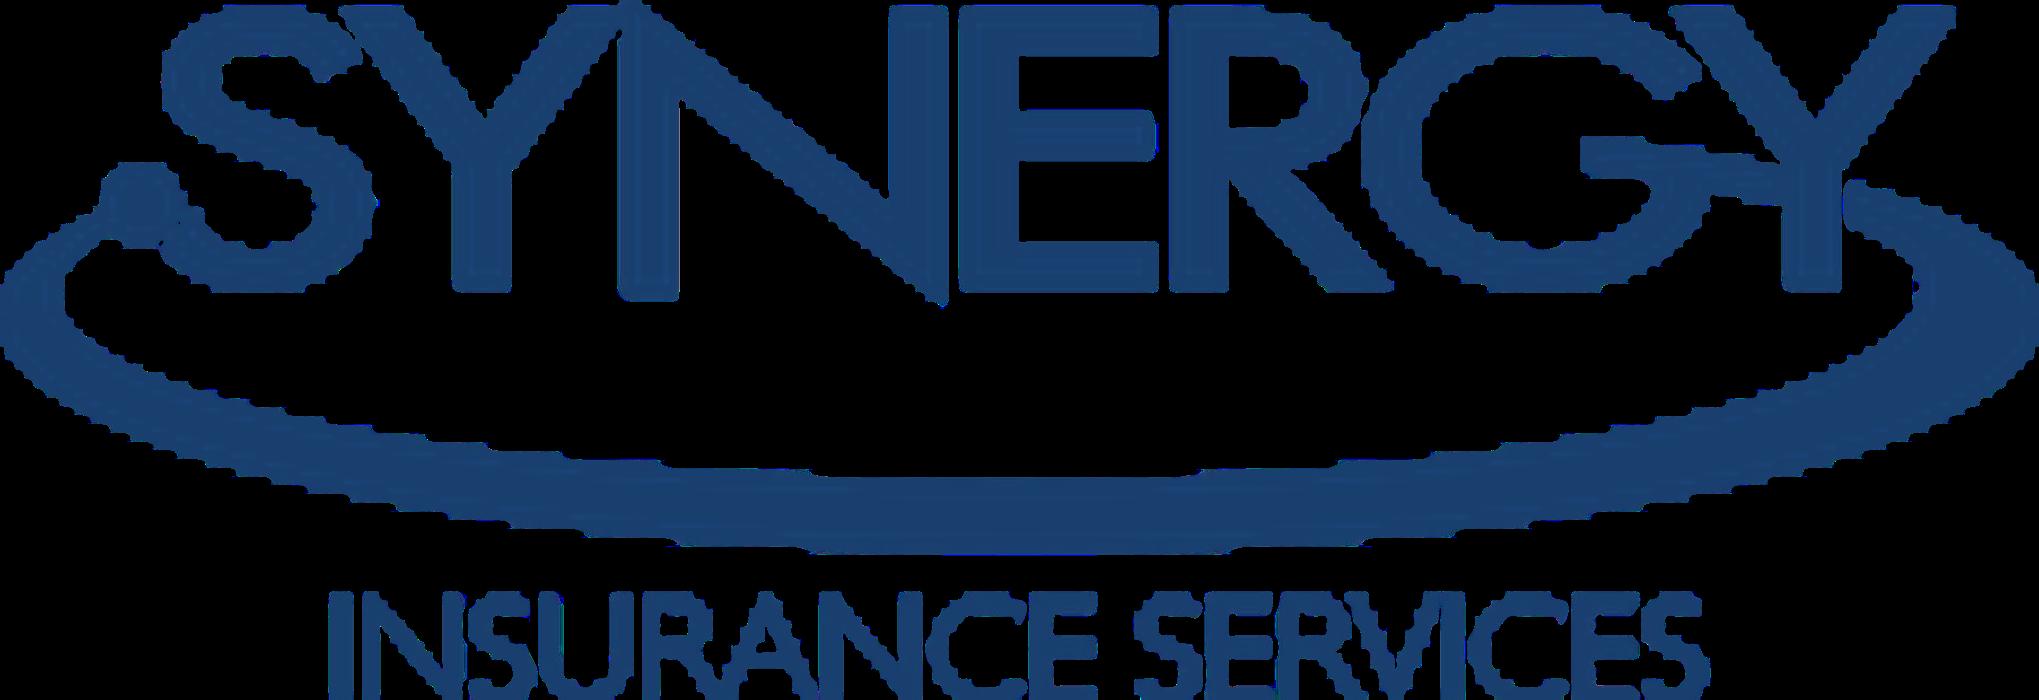 Synergy Insurance Service - Oklahoma City, OK